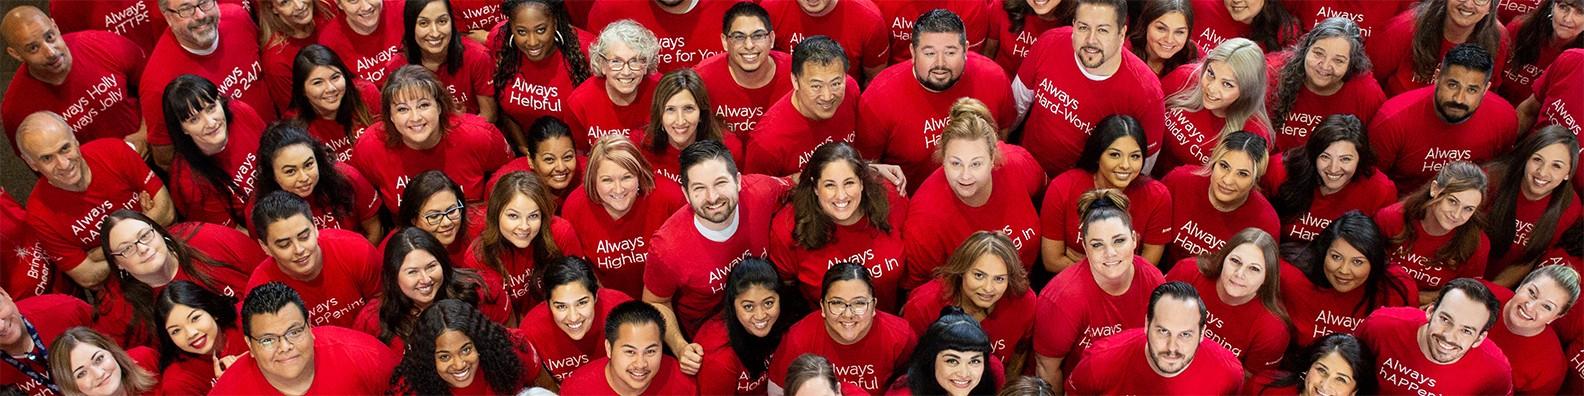 Arrowhead Credit Union Linkedin